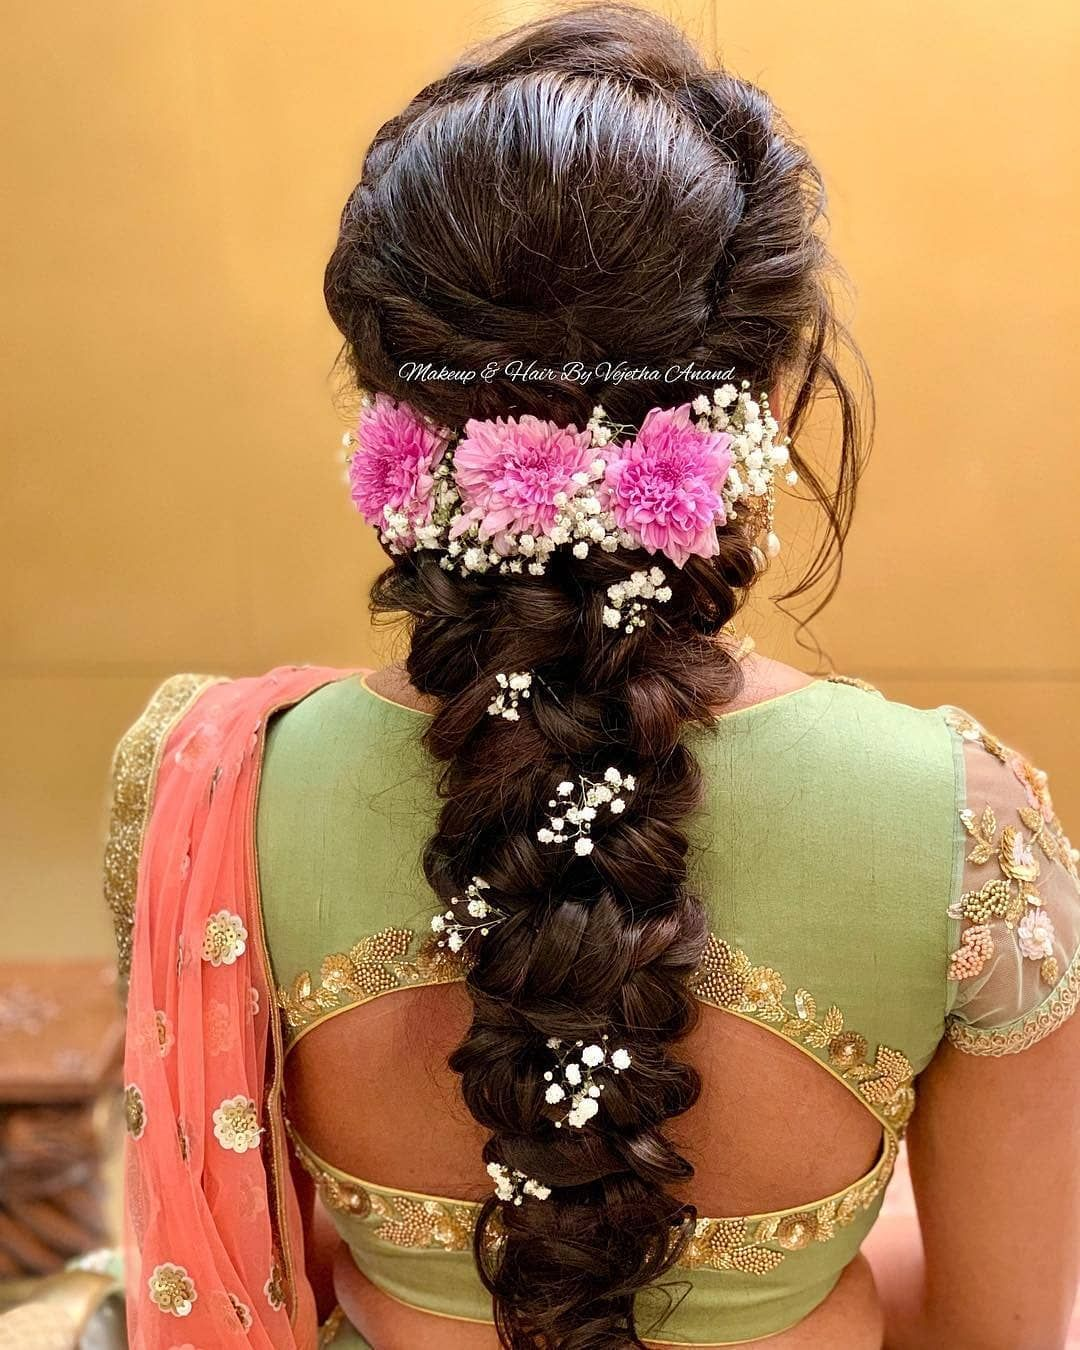 Indian Braids Hairstyle: USE #MADRASIBRIDE Or TAG @MADRASIBRIDE TO …